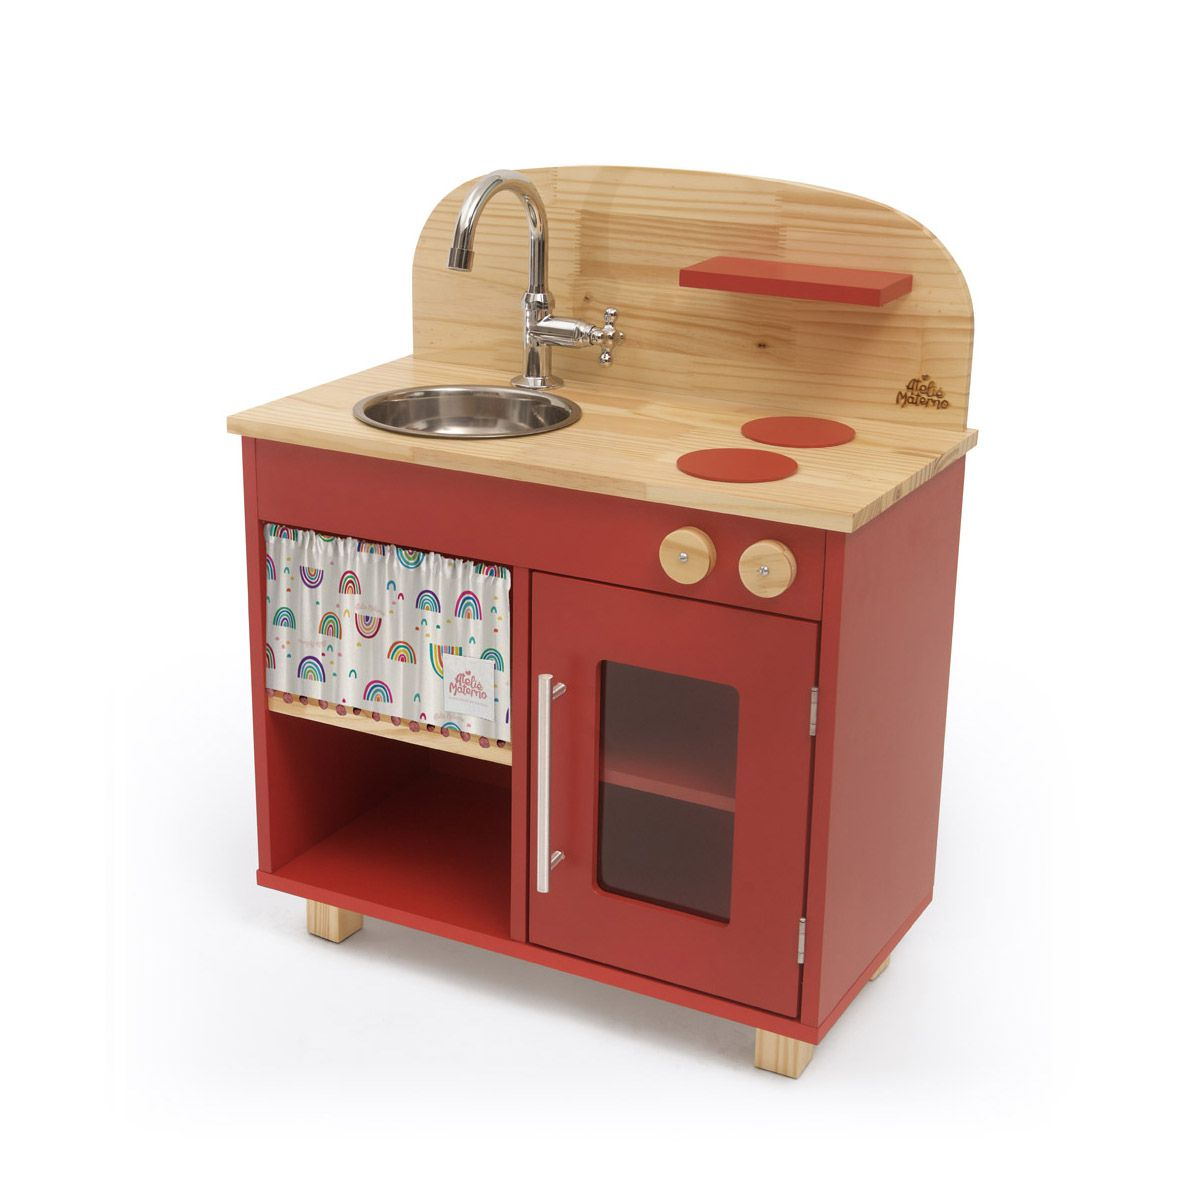 Mini Cozinha - Vermelha